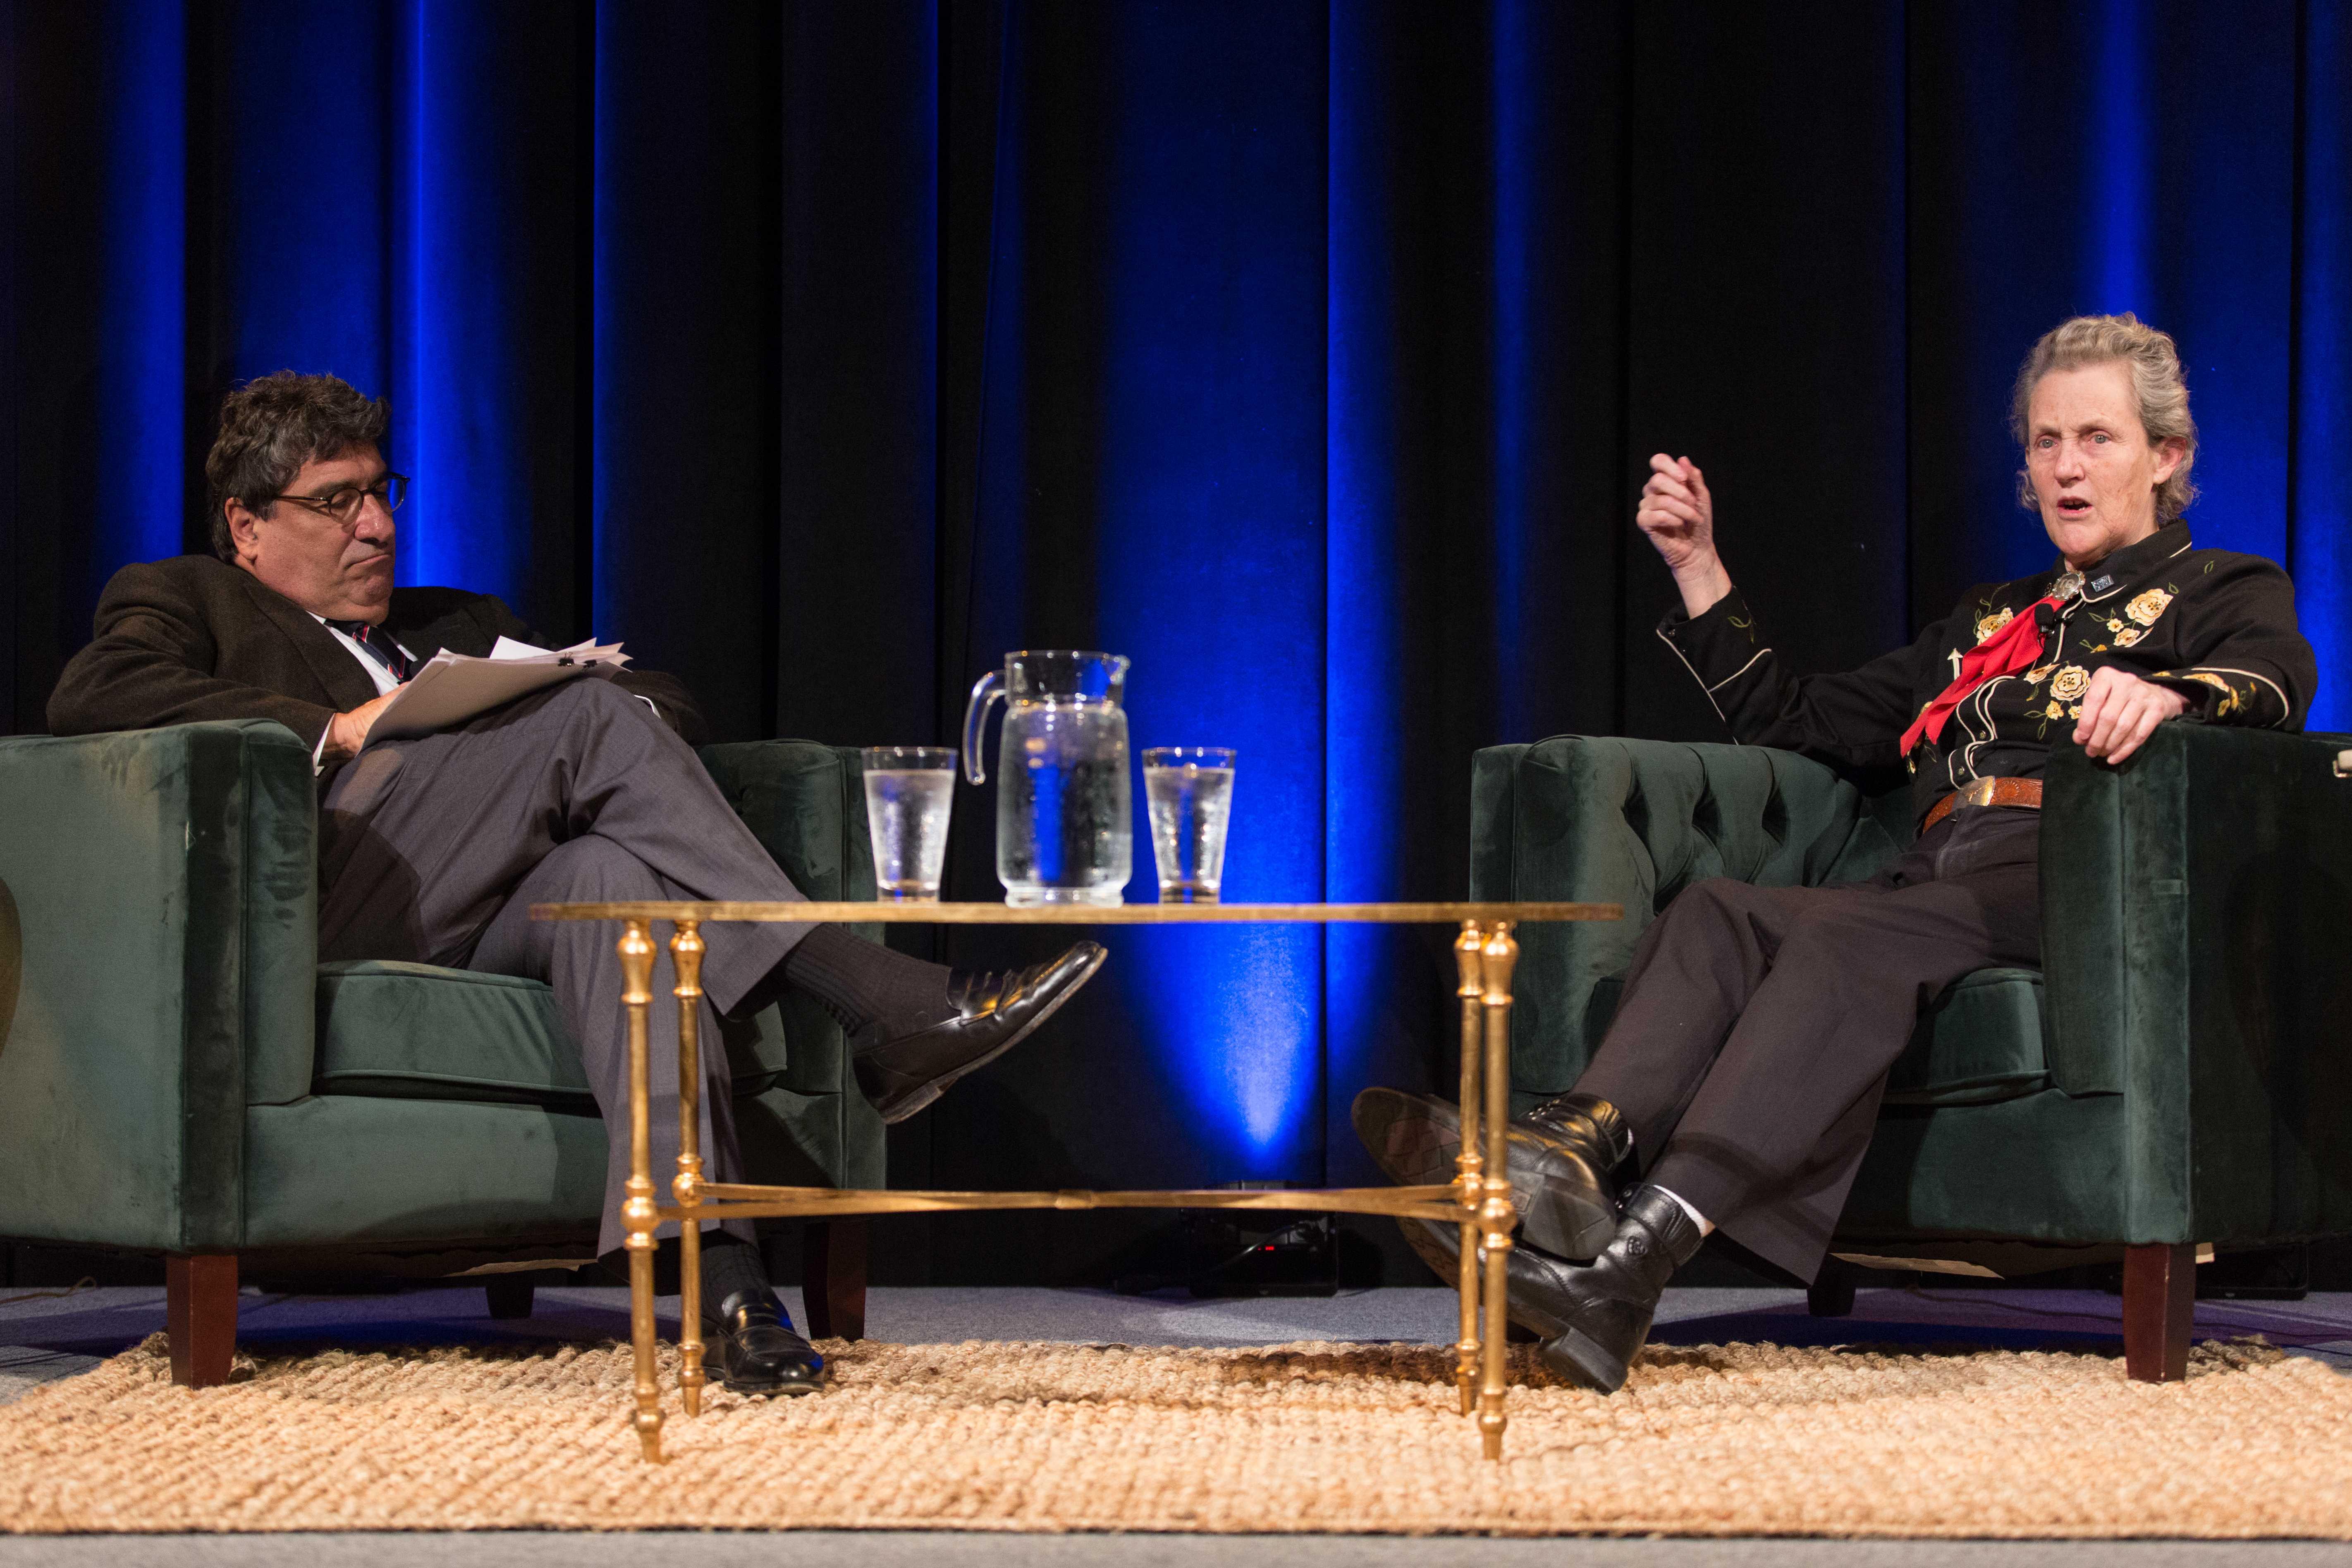 Temple Grandin visits Vanderbilt for the Chancellor's Lecture Series on Thursday, November 29, 2018. (Photo by Claire Barnett)